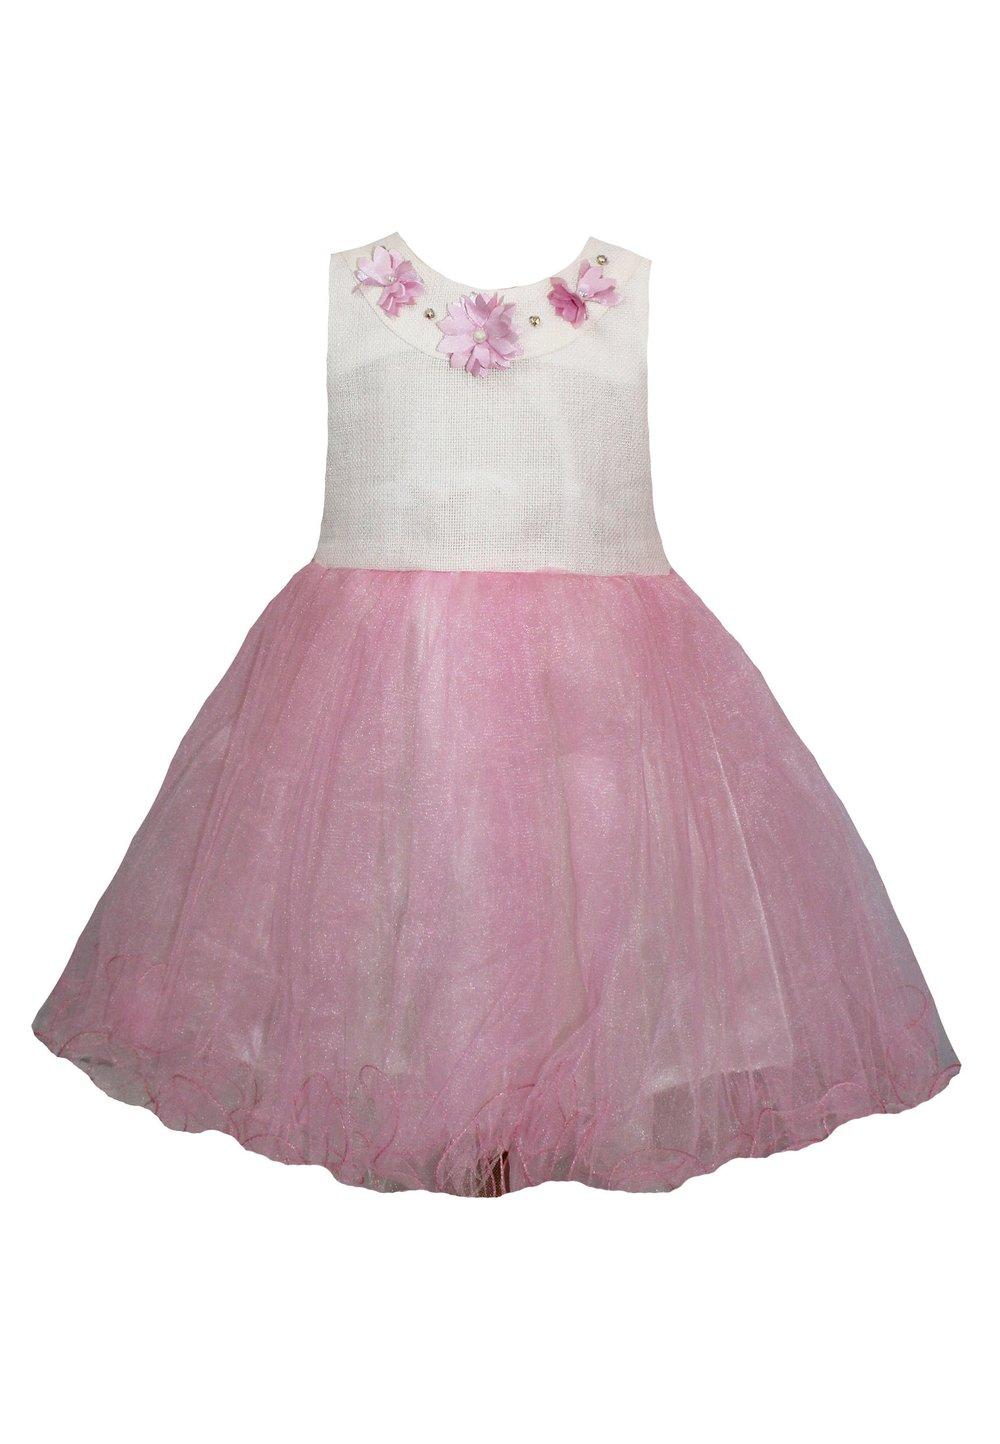 Rochita, cu floricele roz deschis imagine